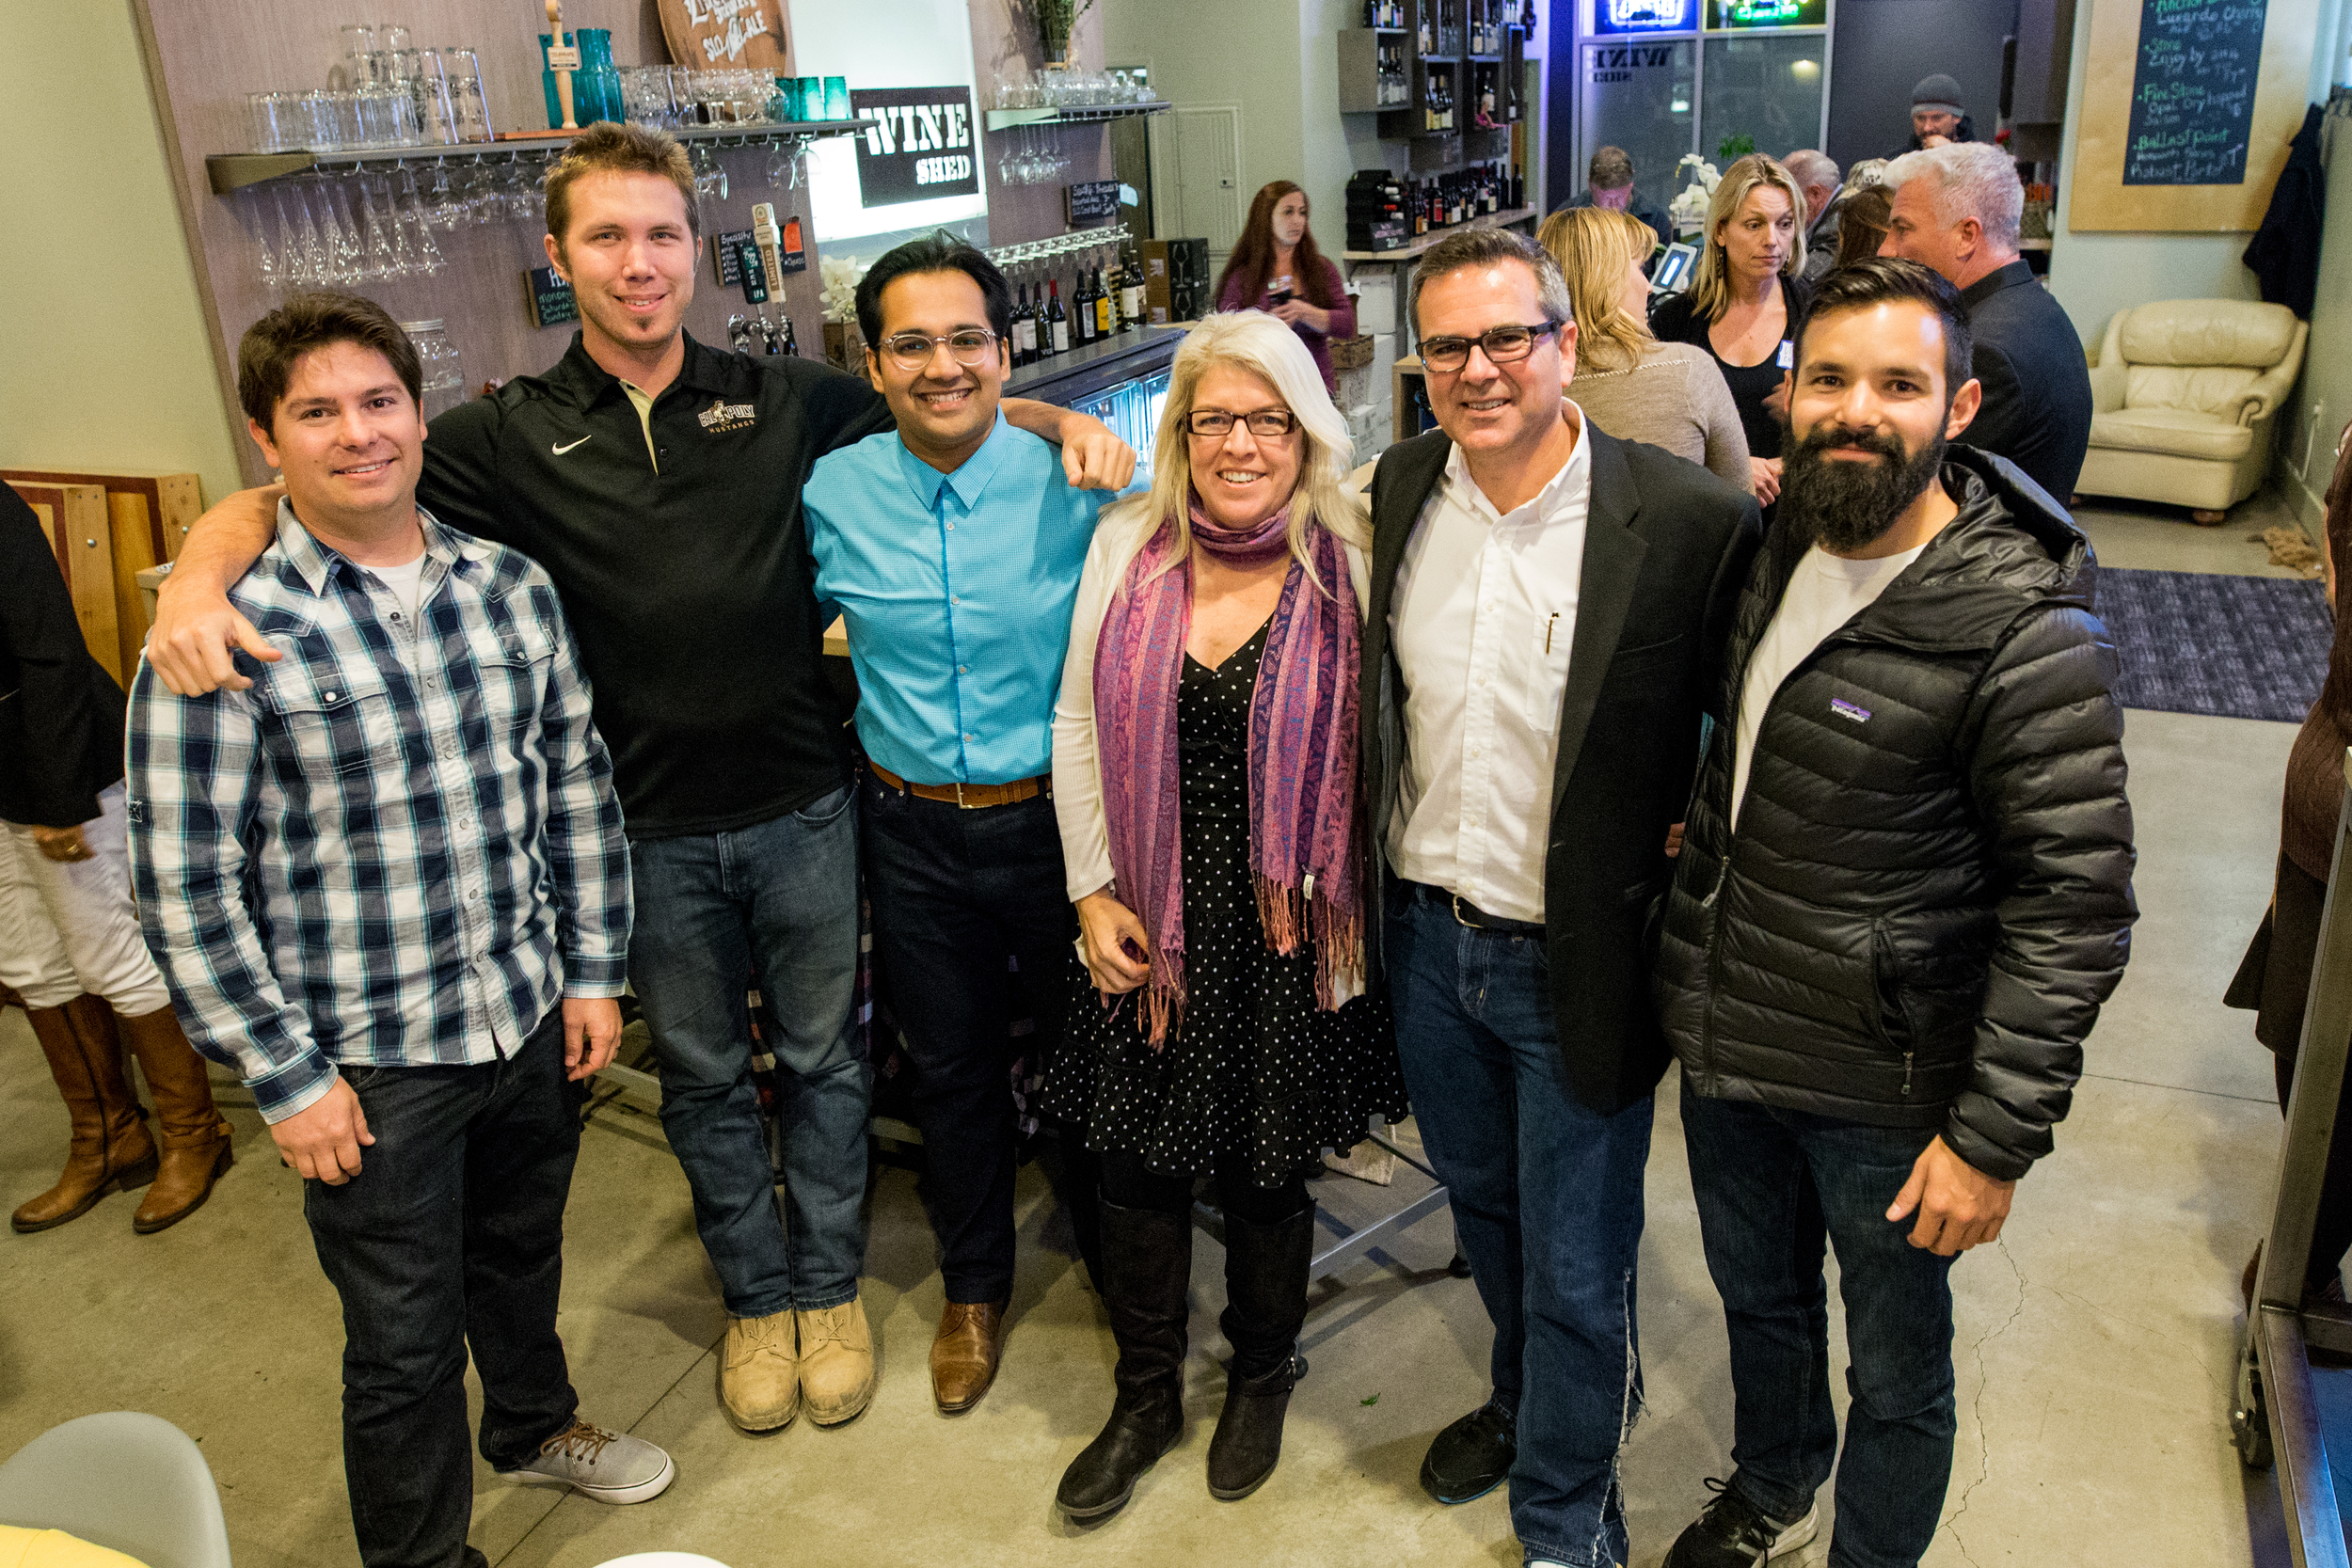 2017 dwellforward team    left to right: Ian Ferguson (Co-Chair), Enrique Ivers (superdweller), M. Farid Shahid (Co-Chair), Dove Daniel (Co-Chair), Jefferson Eckles (Executive Director, HBACC), William Vega (superdweller).